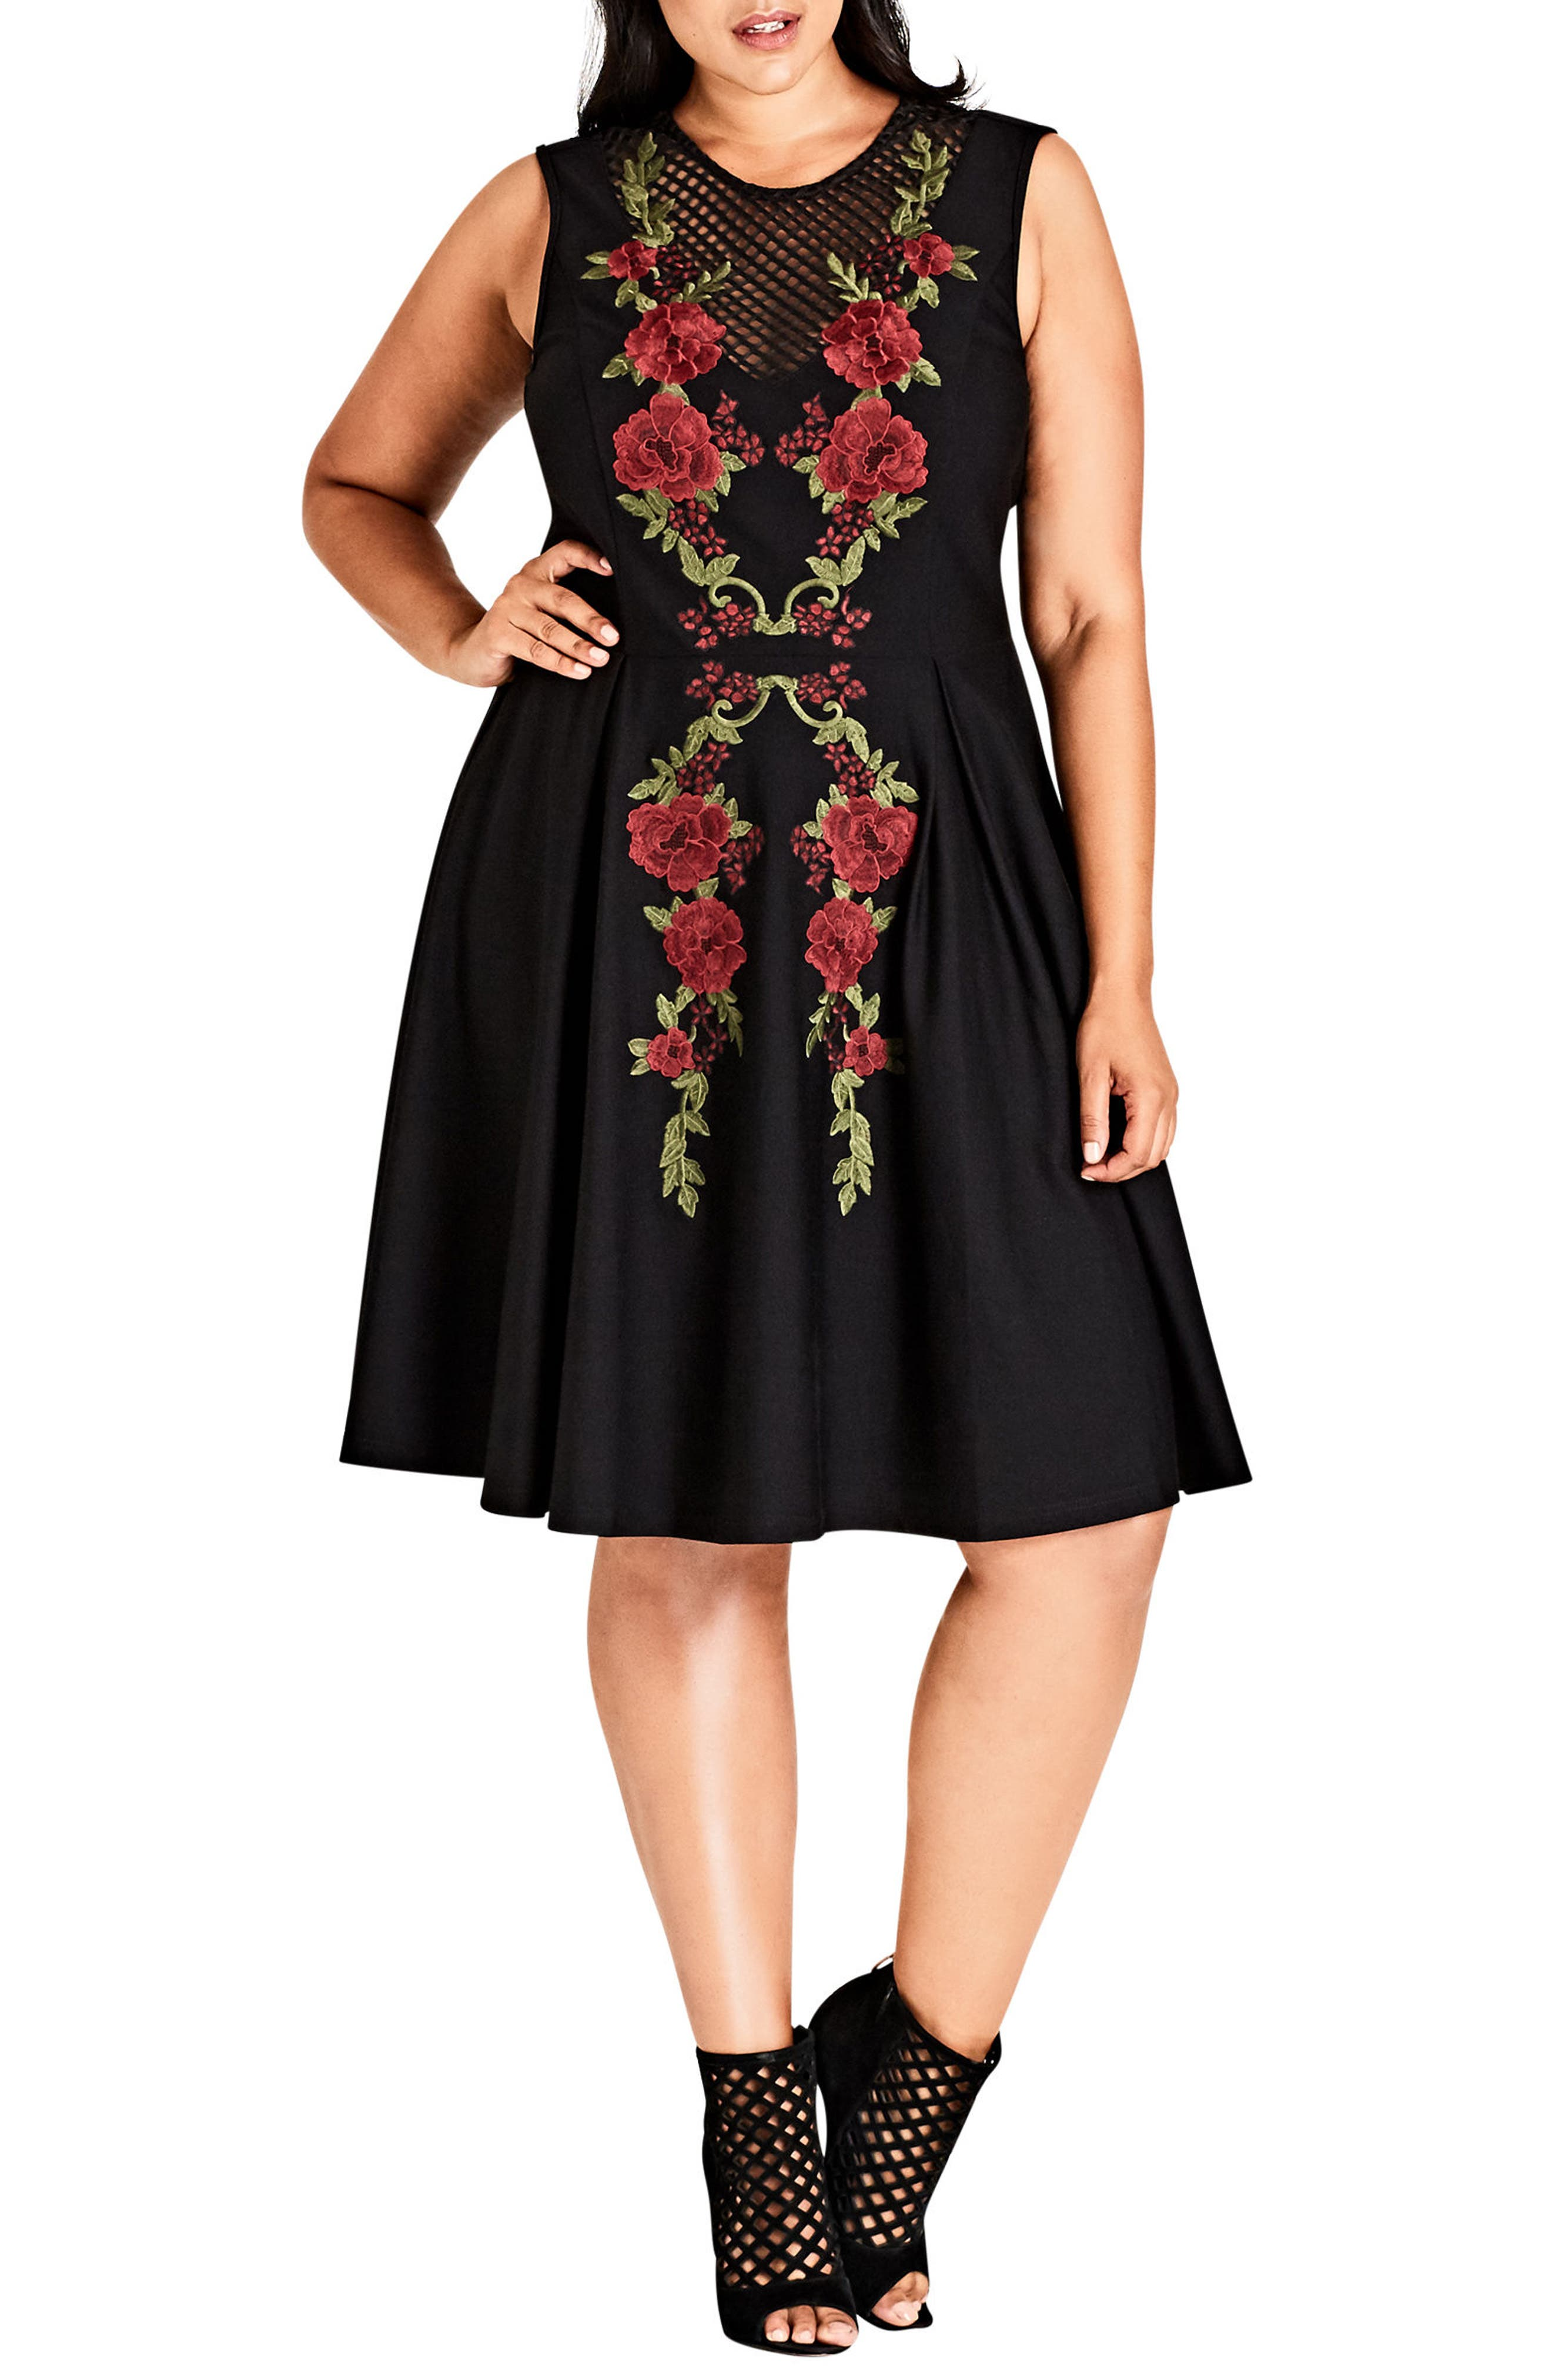 Rose Adore Fit & Flare Dress,                         Main,                         color, Black